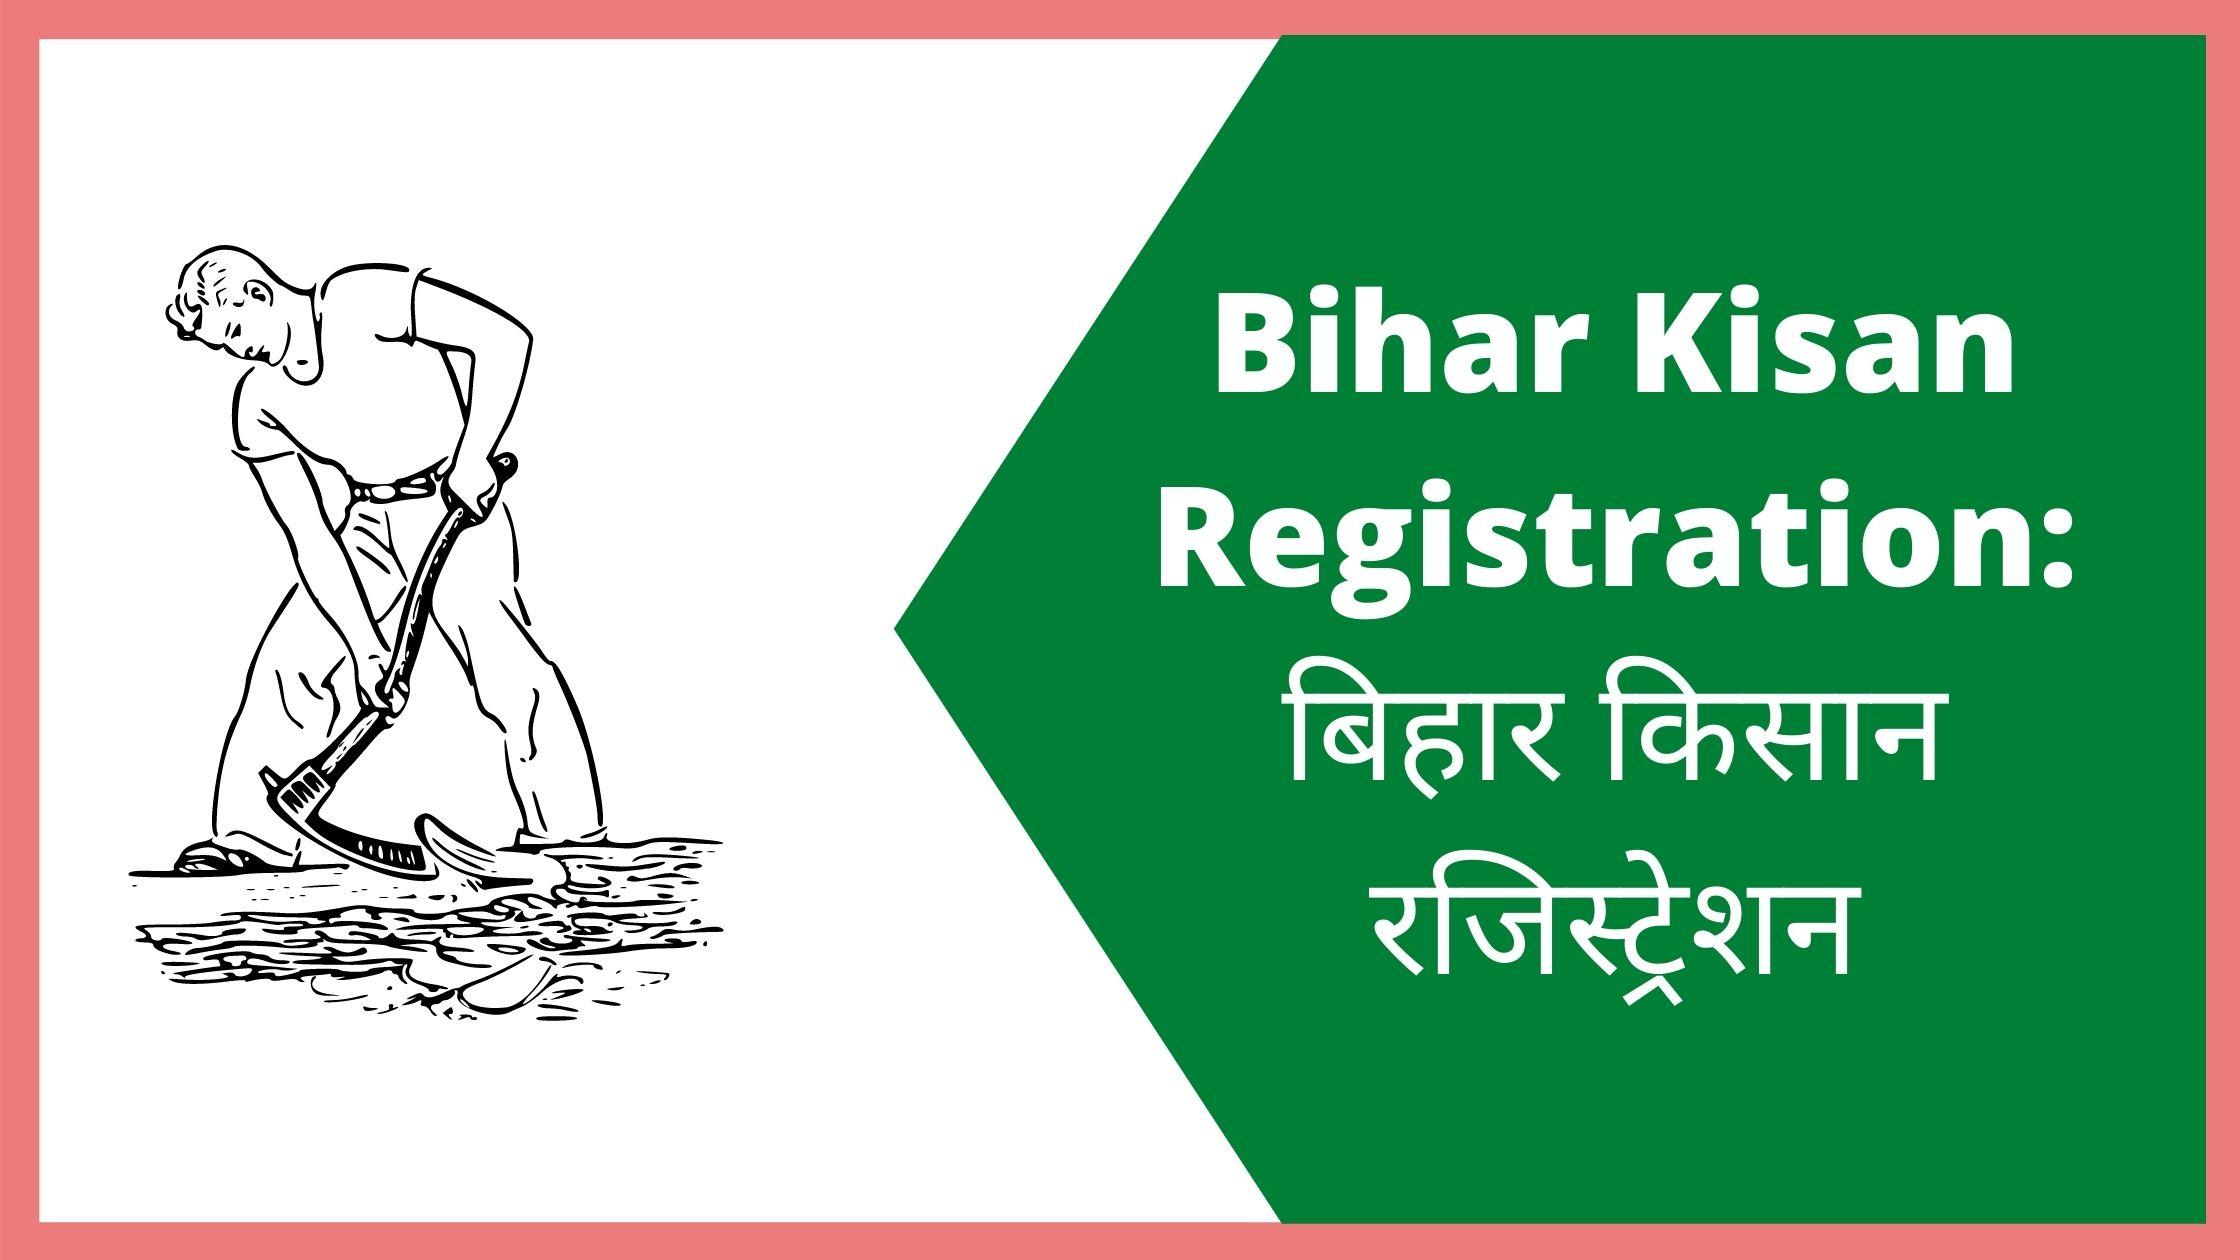 Bihar Kisan Registration: बिहार किसान रजिस्ट्रेशन